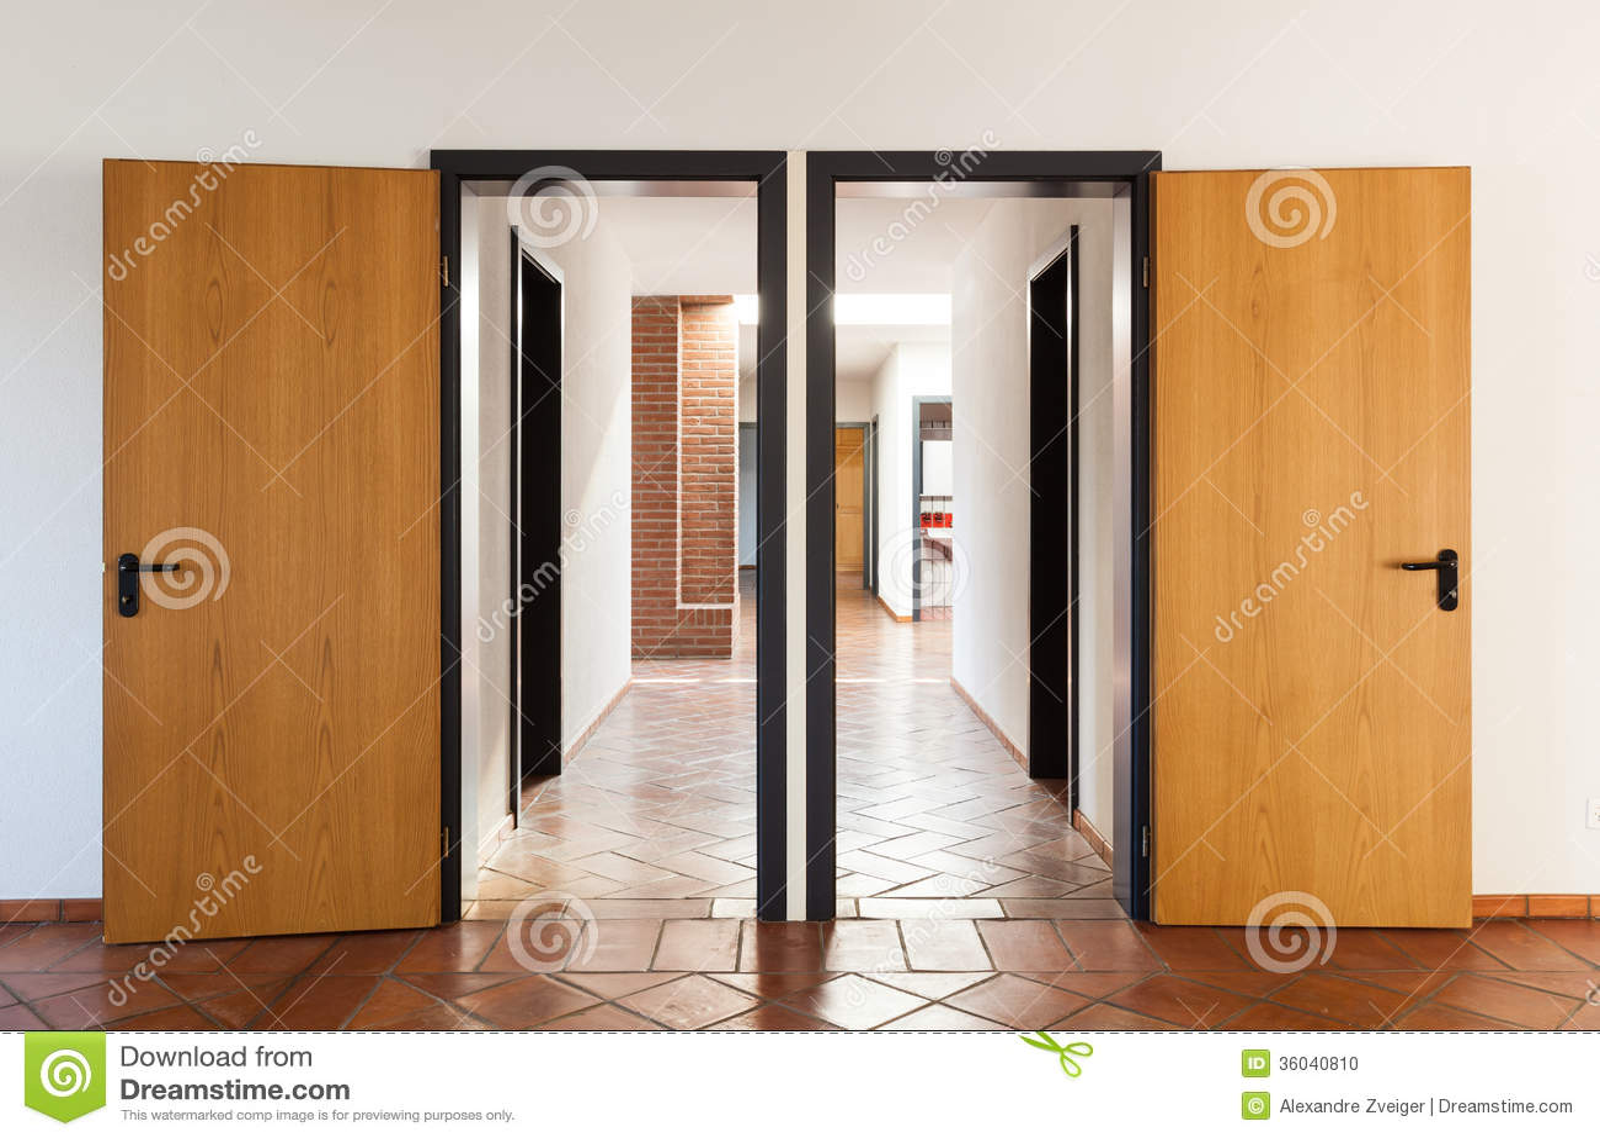 Stock Room Doors : Nterior empty room with two doors stock photo image